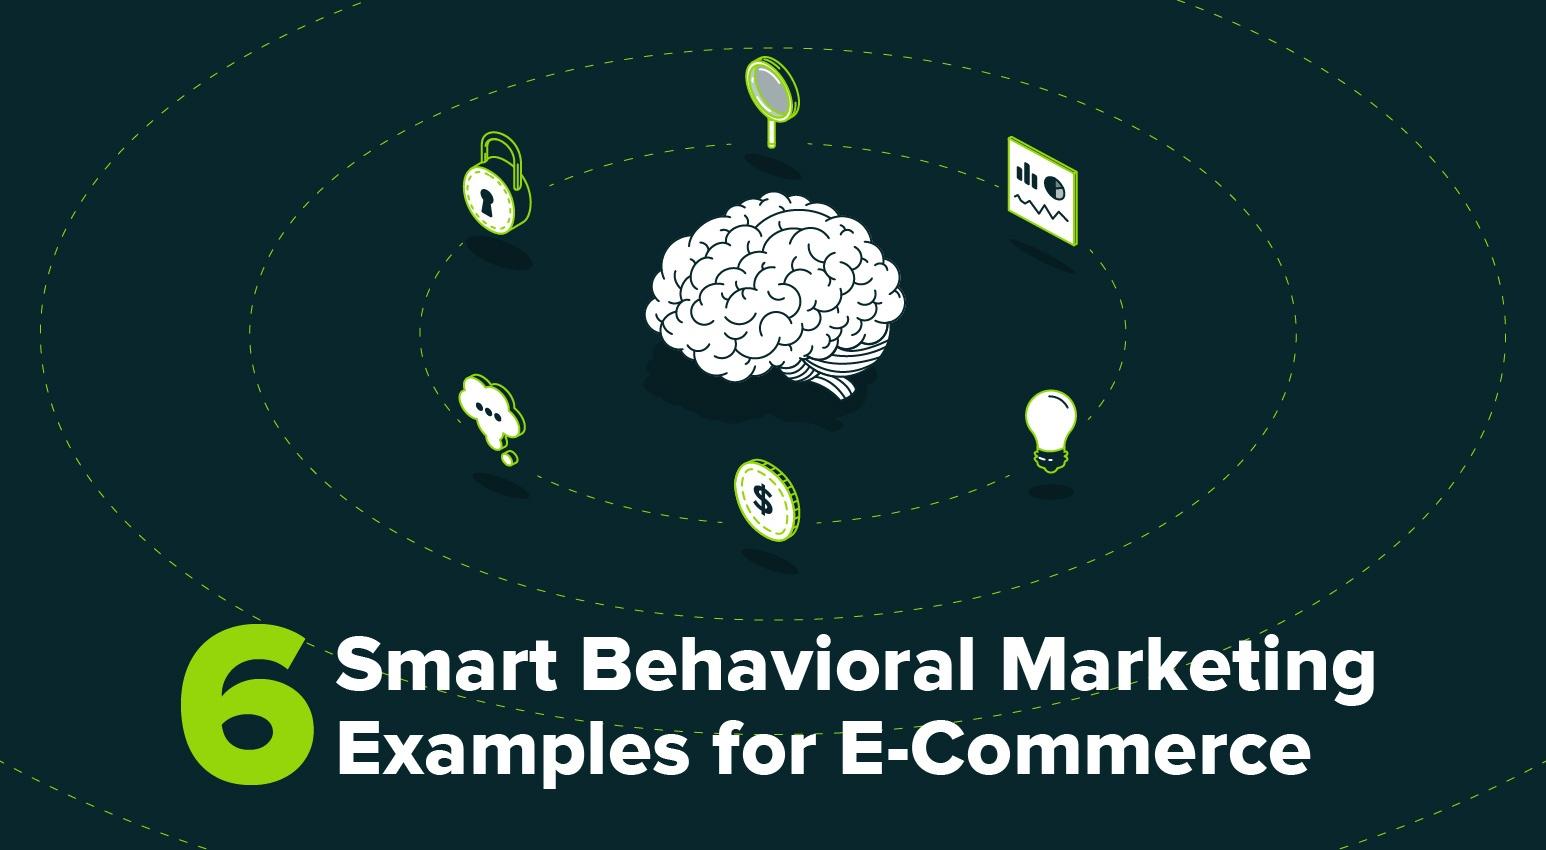 6-smart-behavioral-marketing-ecommerce-examples.jpg